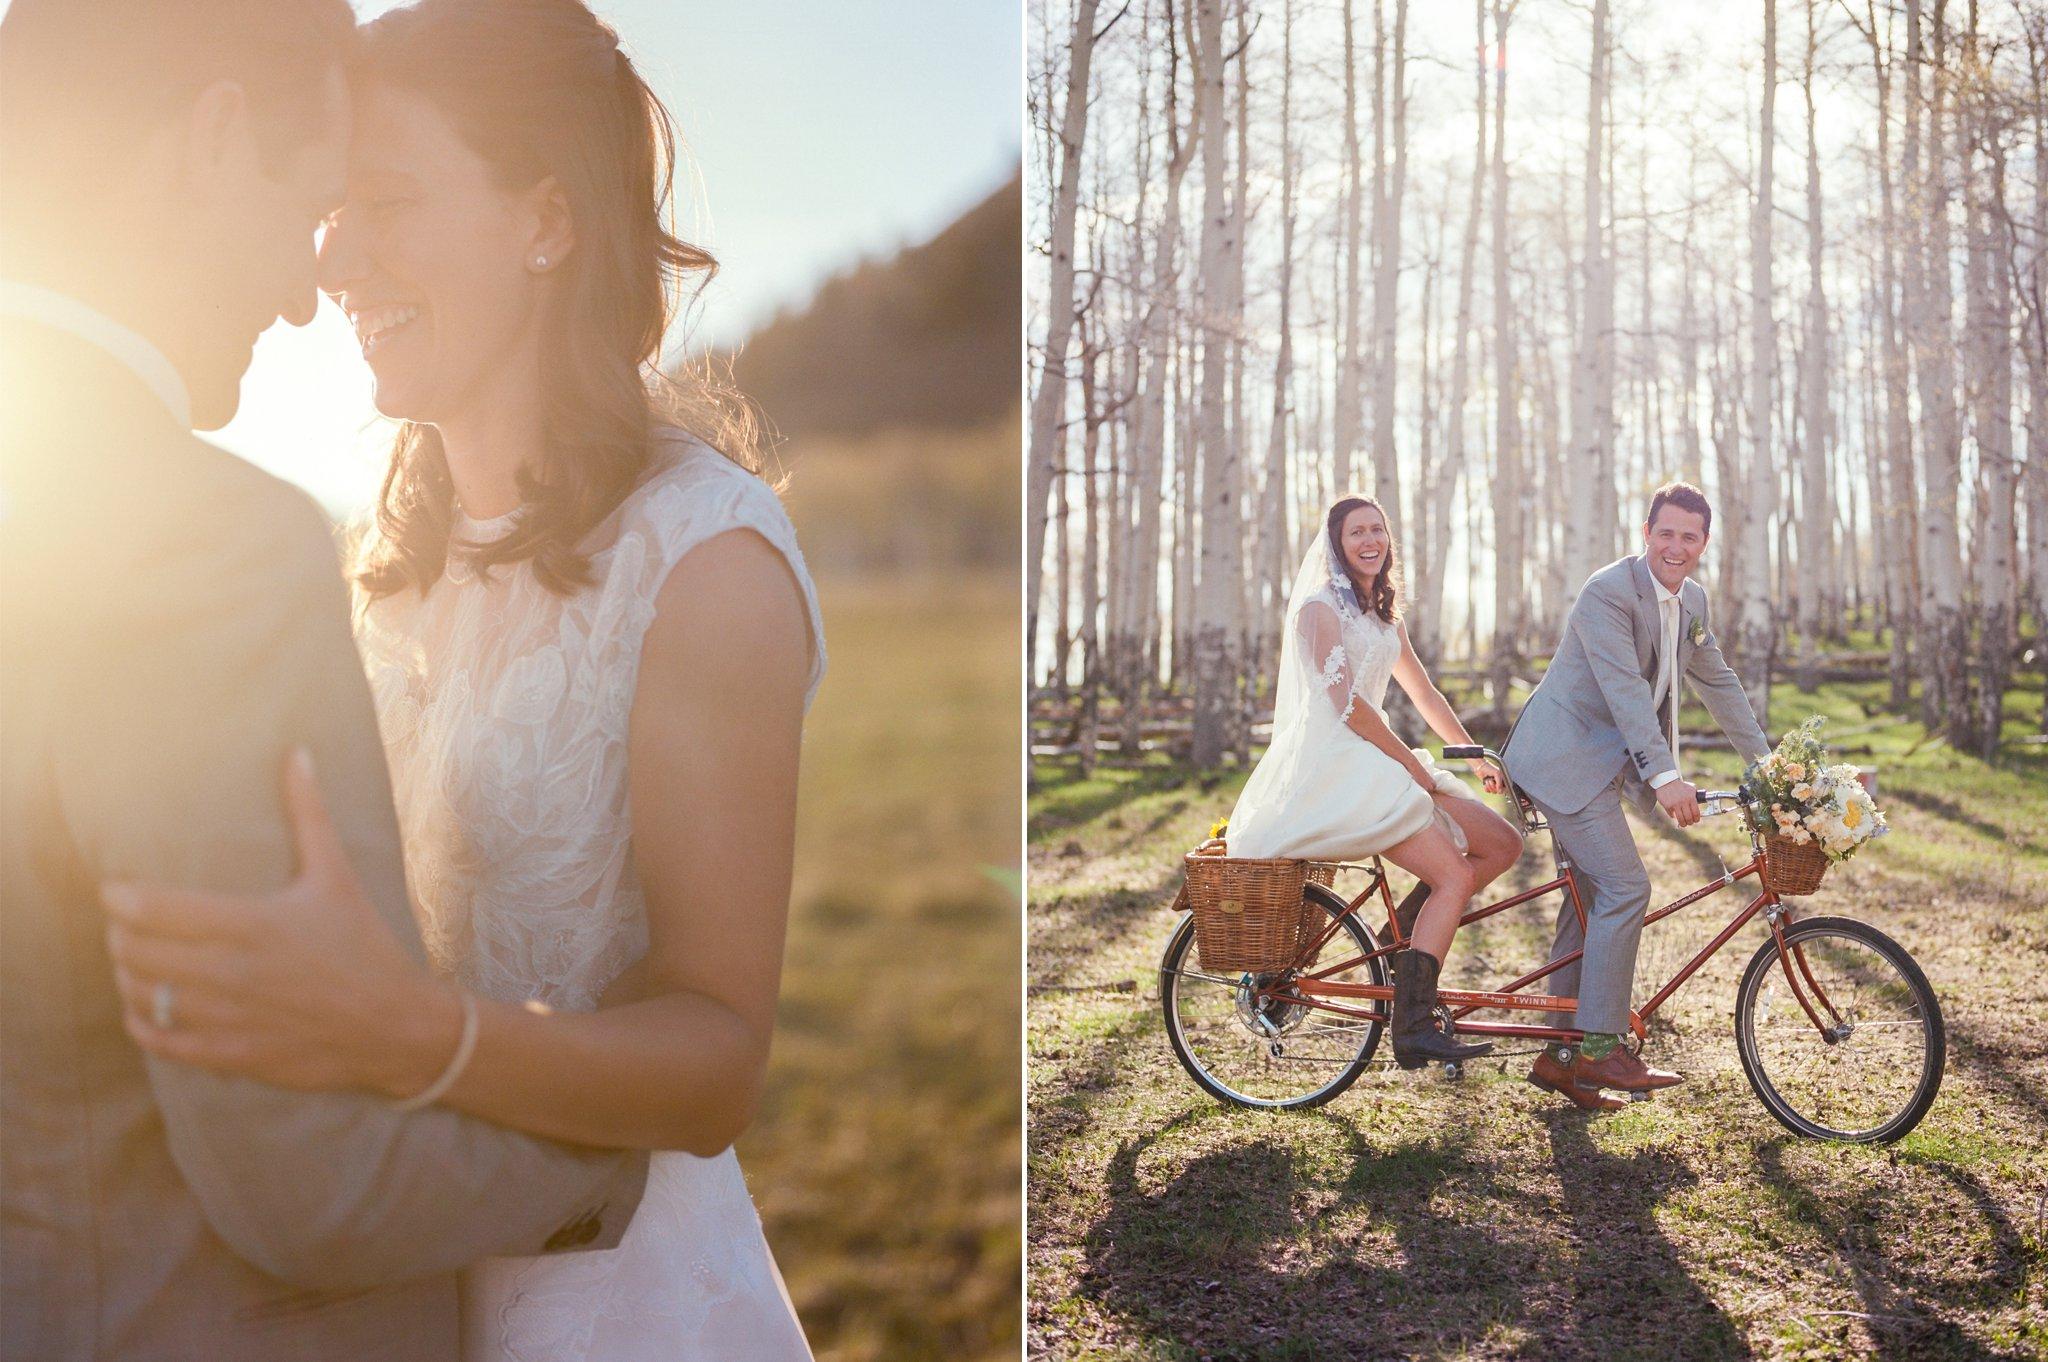 telluride wedding photographer colorado wedding photographer shannon griffin photography_0008.jpg